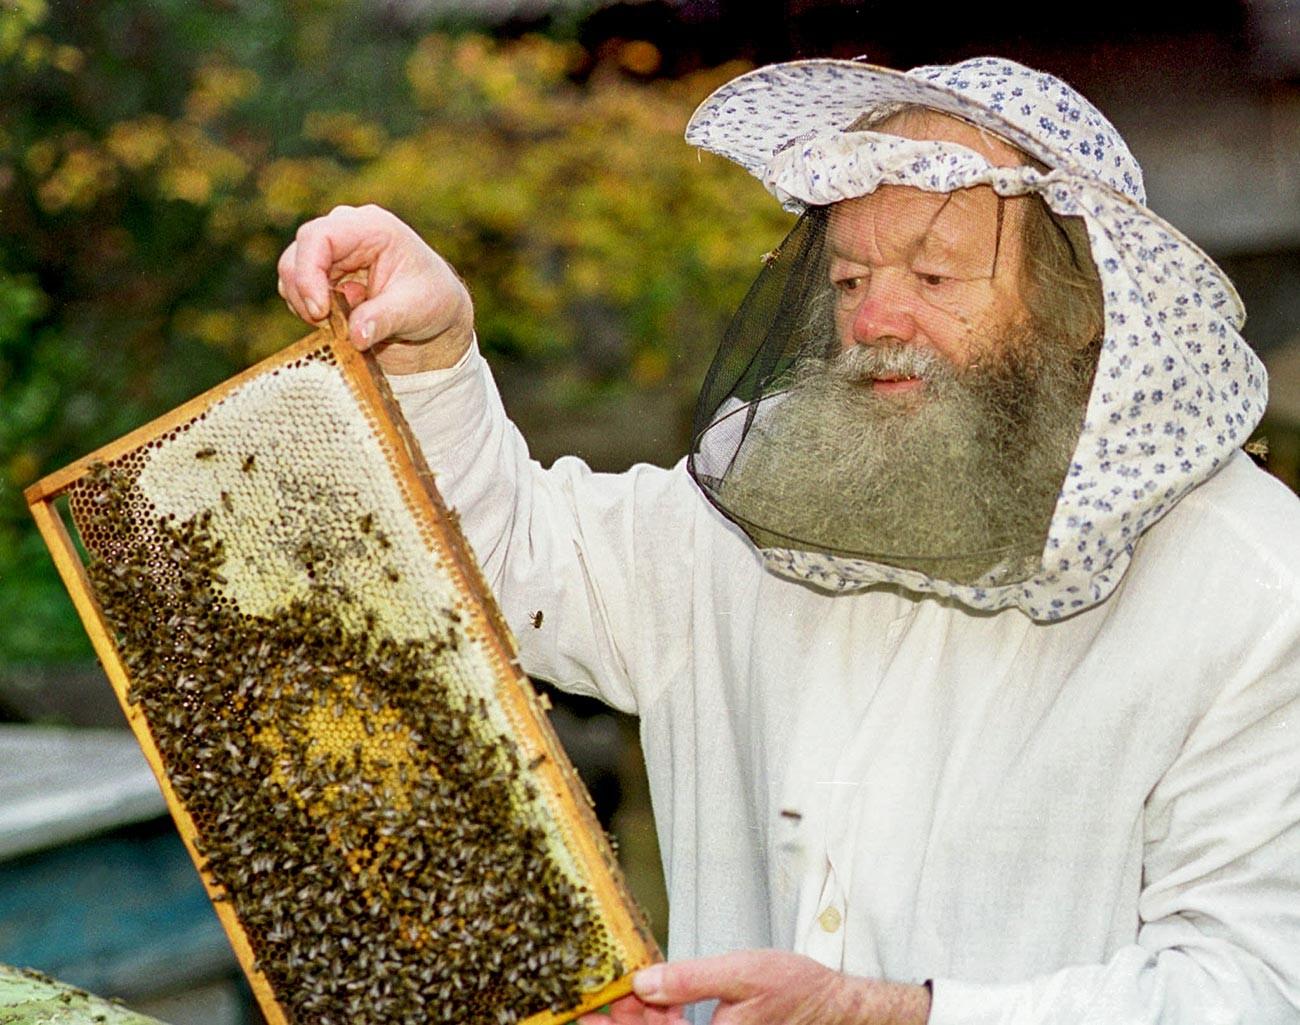 Memproduksi madu adalah salah satu kerajinan Rusia yang tertua.